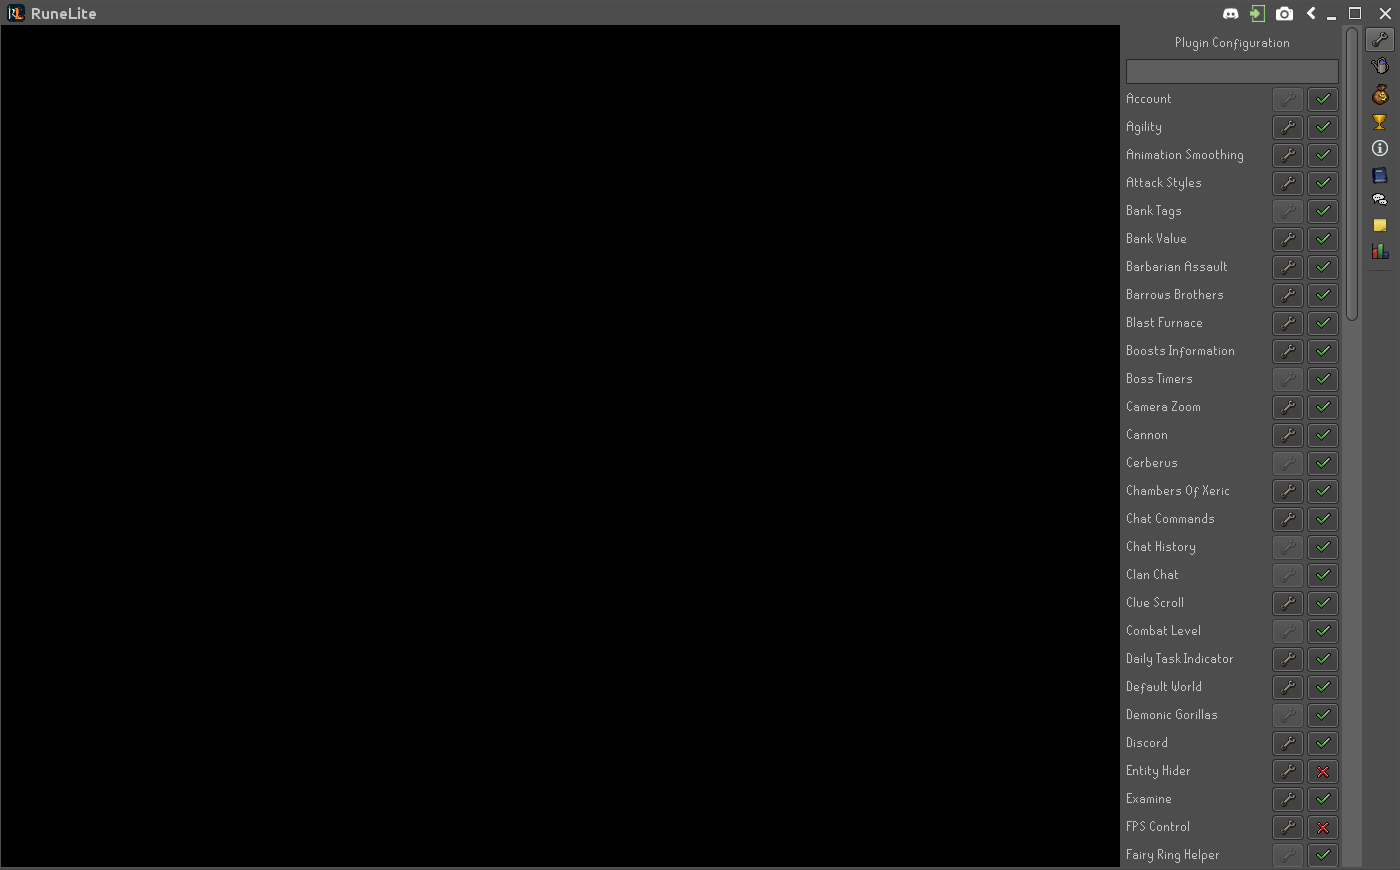 Client black screen on Ubuntu 16 04 · Issue #2675 · runelite